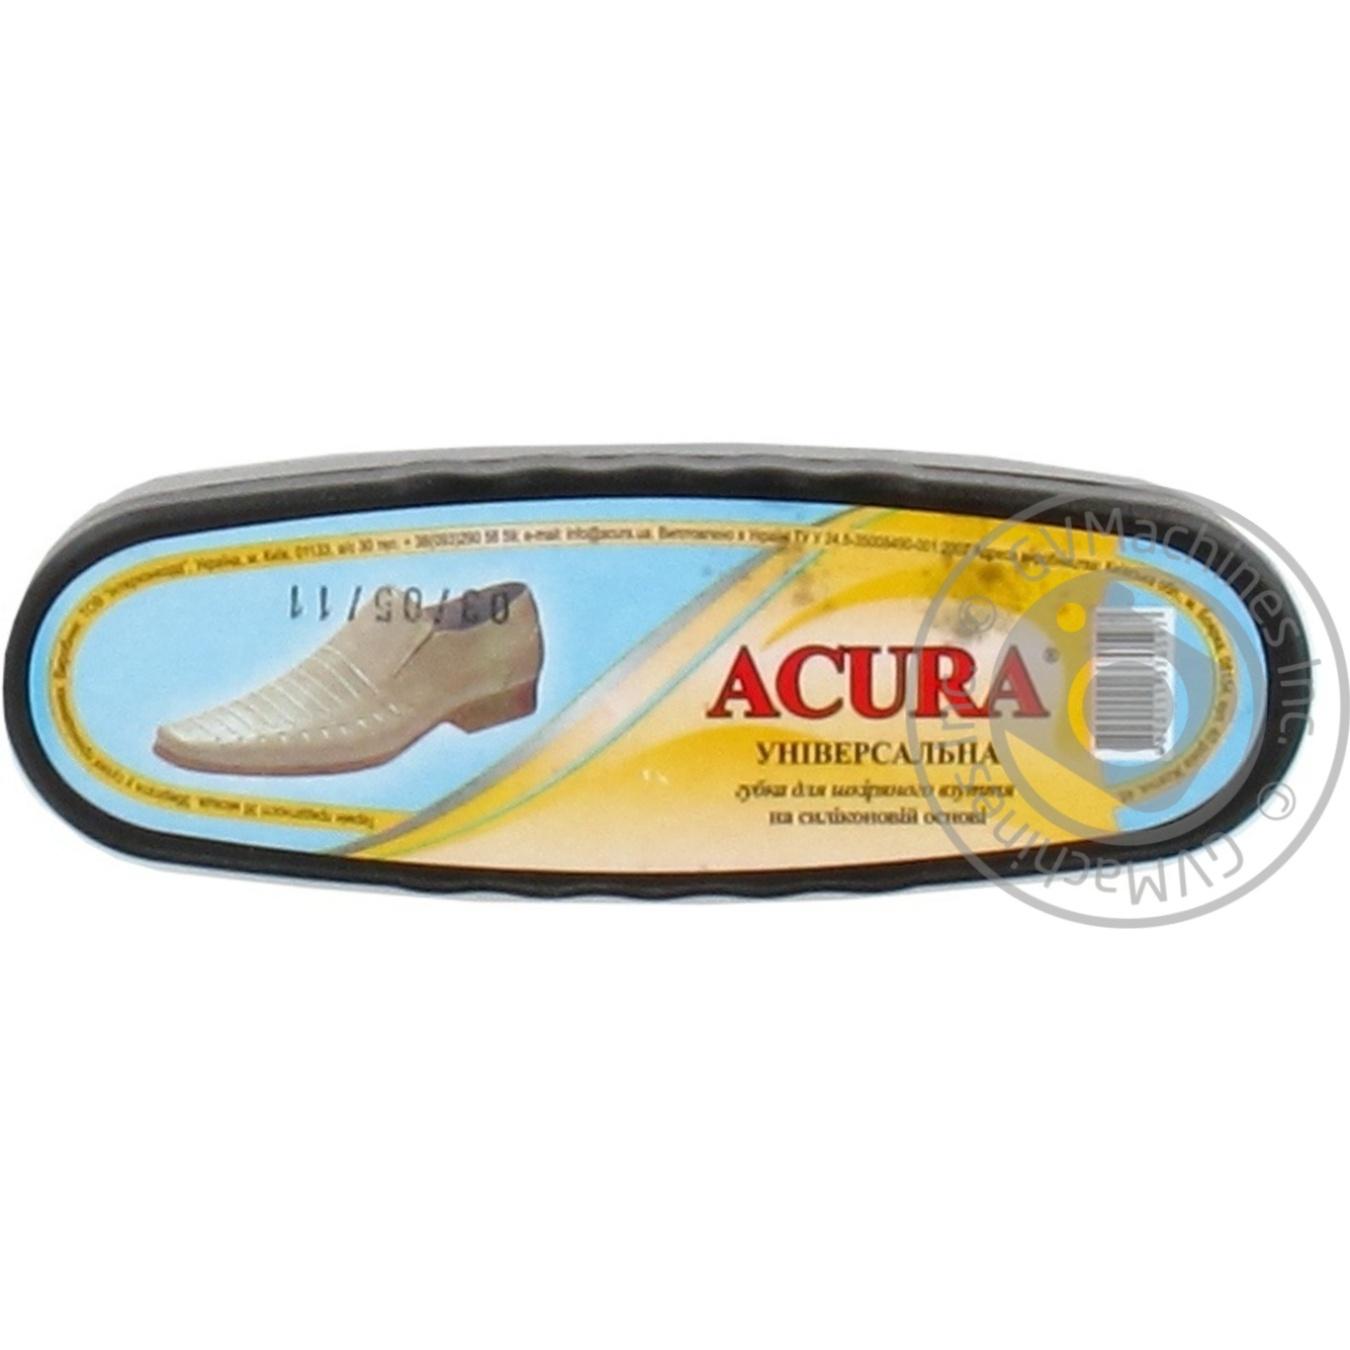 Sponge Acura colorless for shoes Ukraine → Household → Household on